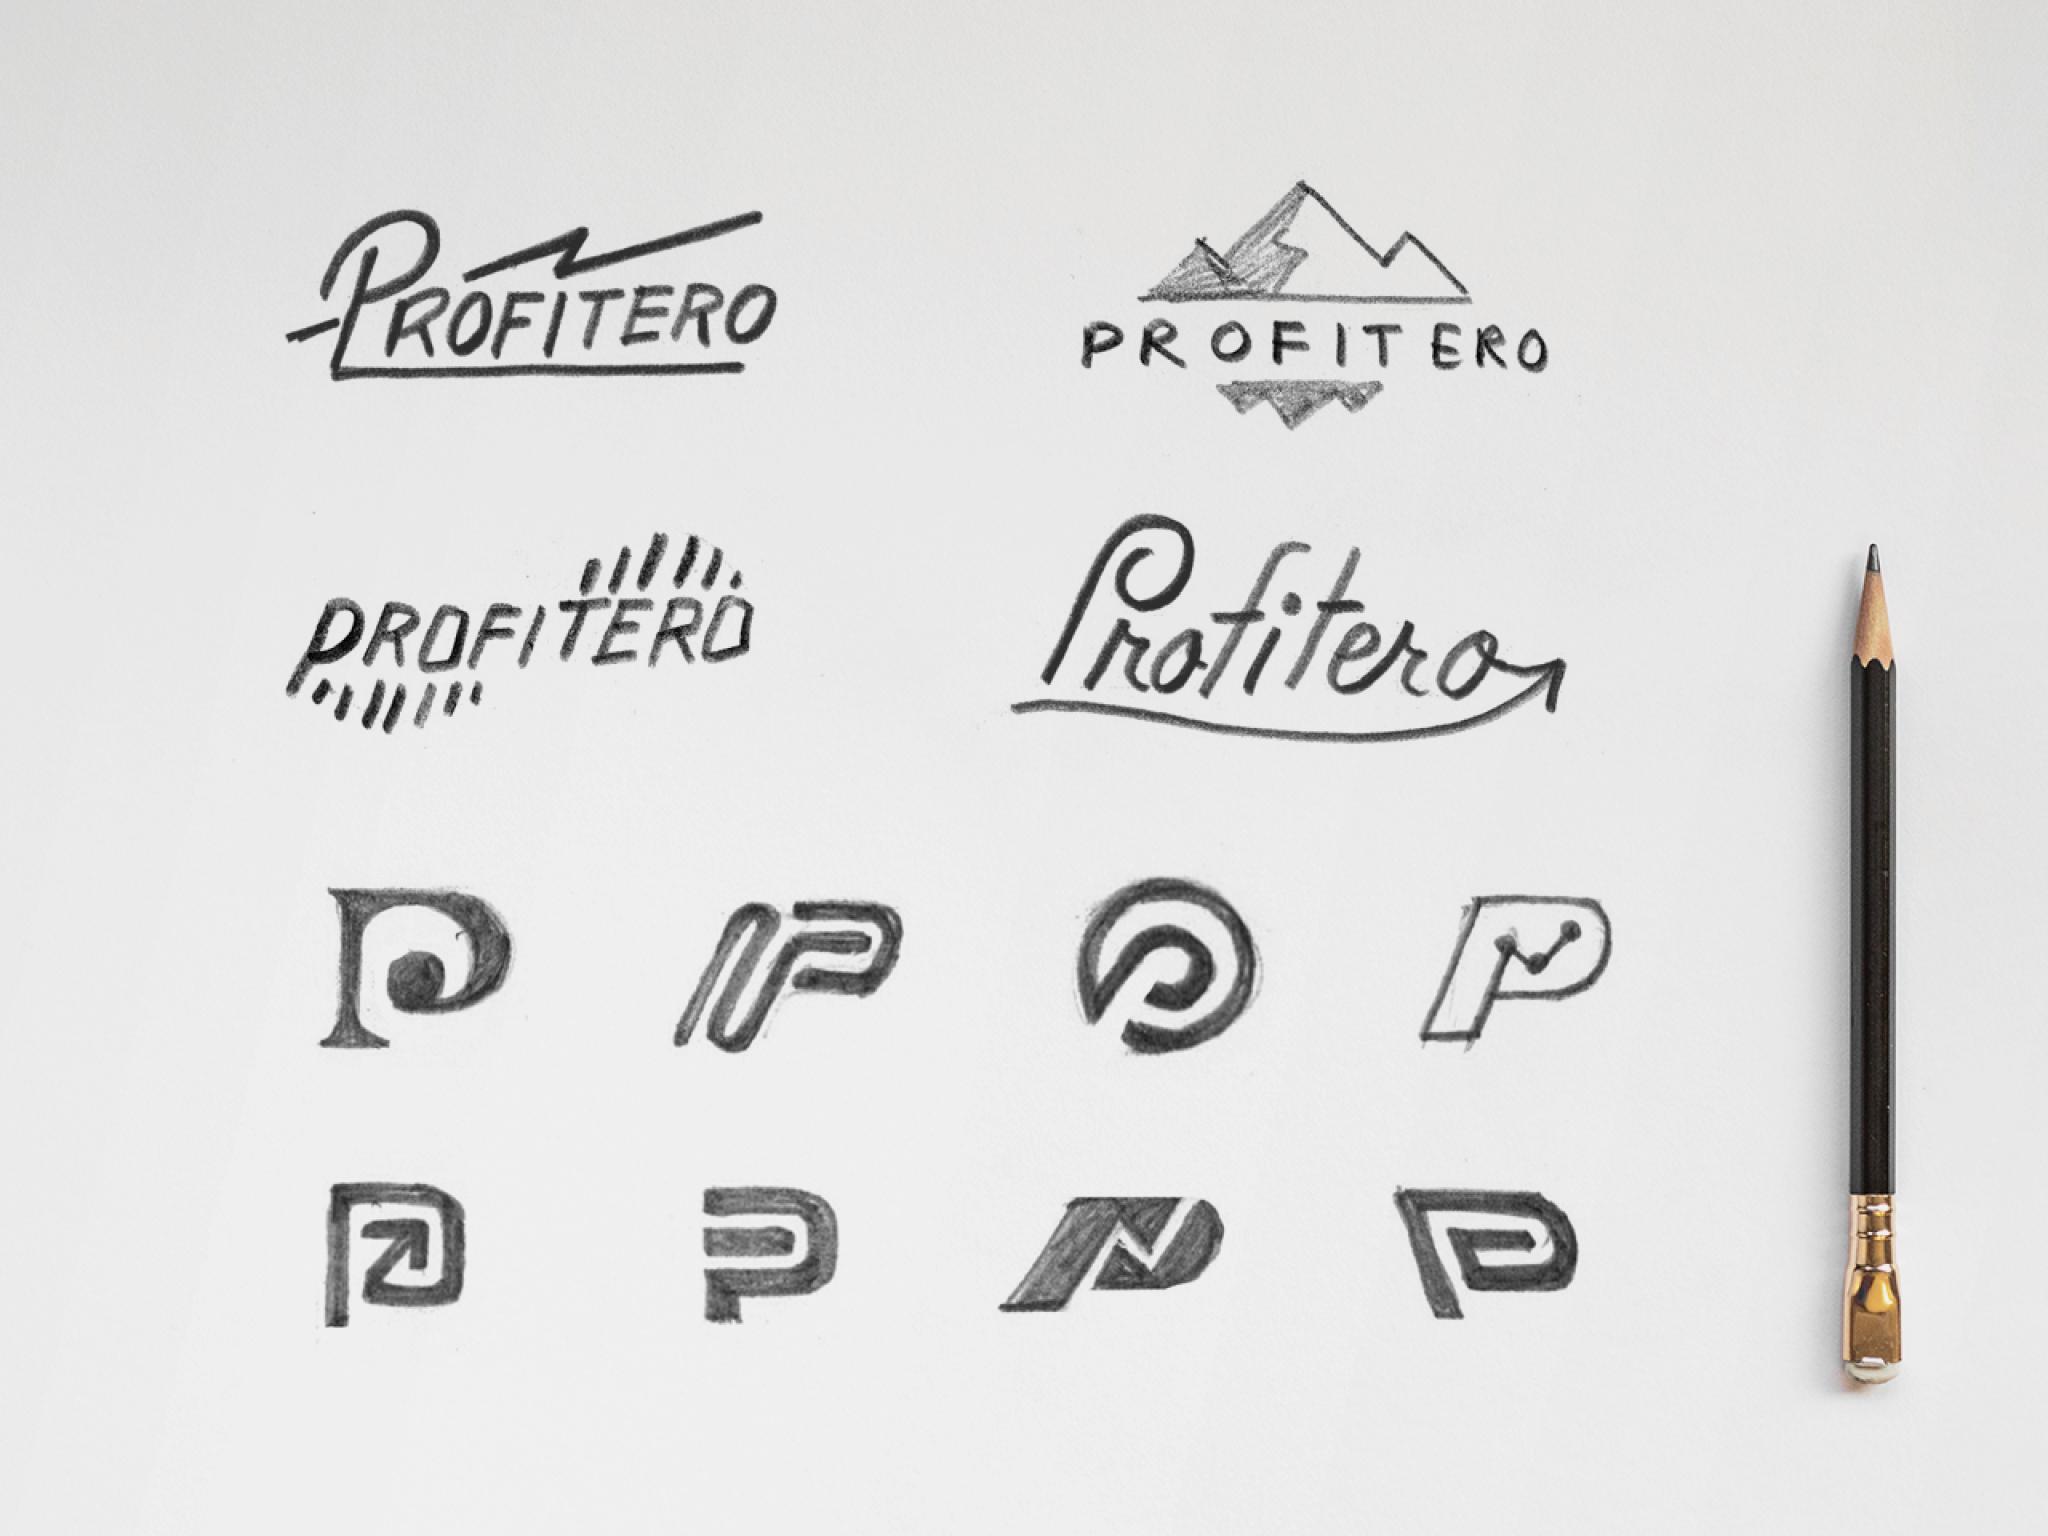 plt_profitero5.jpg